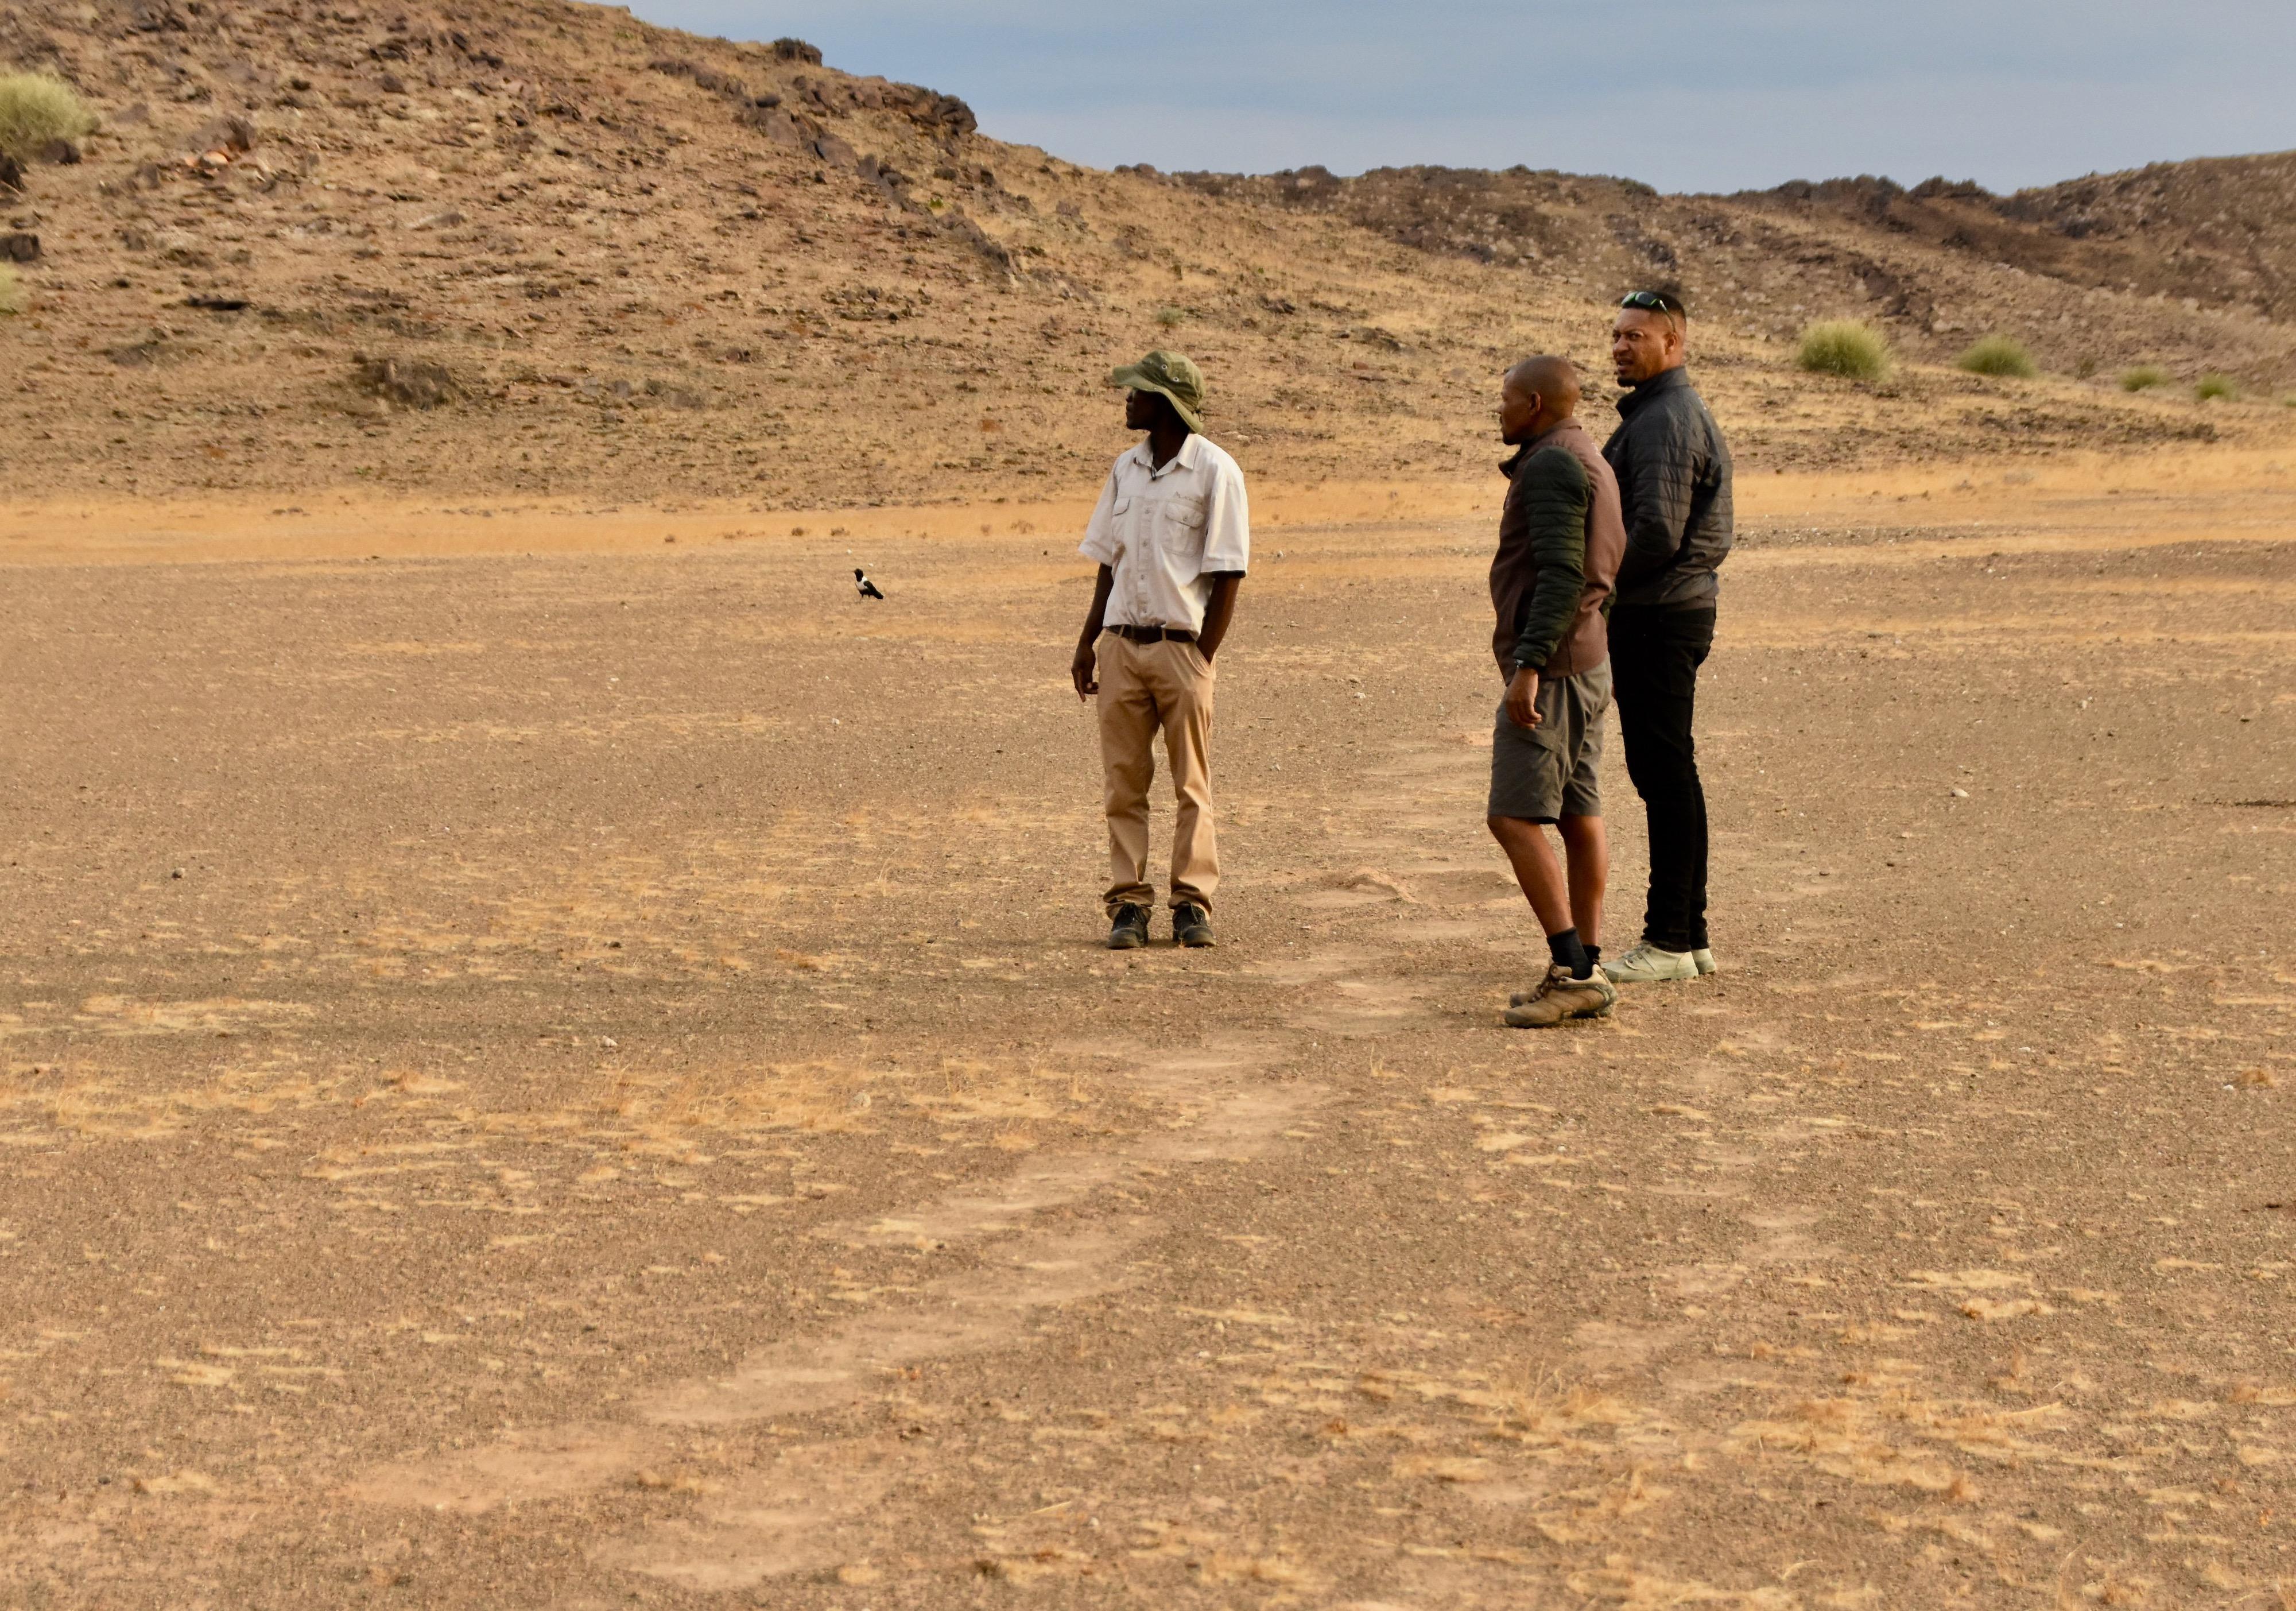 Tracking Elephants in Damaraland